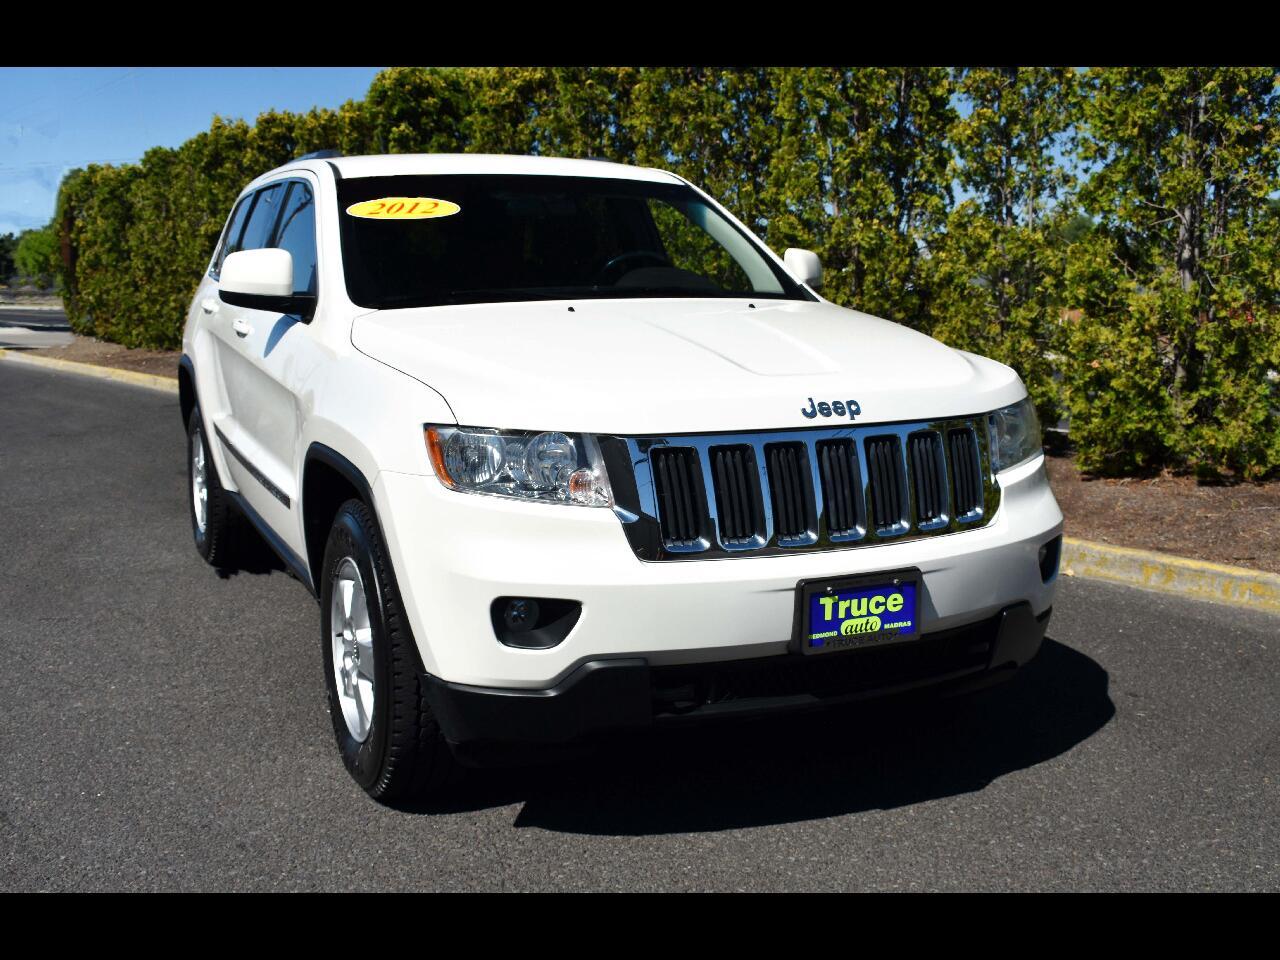 2012 Jeep Grand Cherokee 4WD 4dr Laredo**LOW MILES**